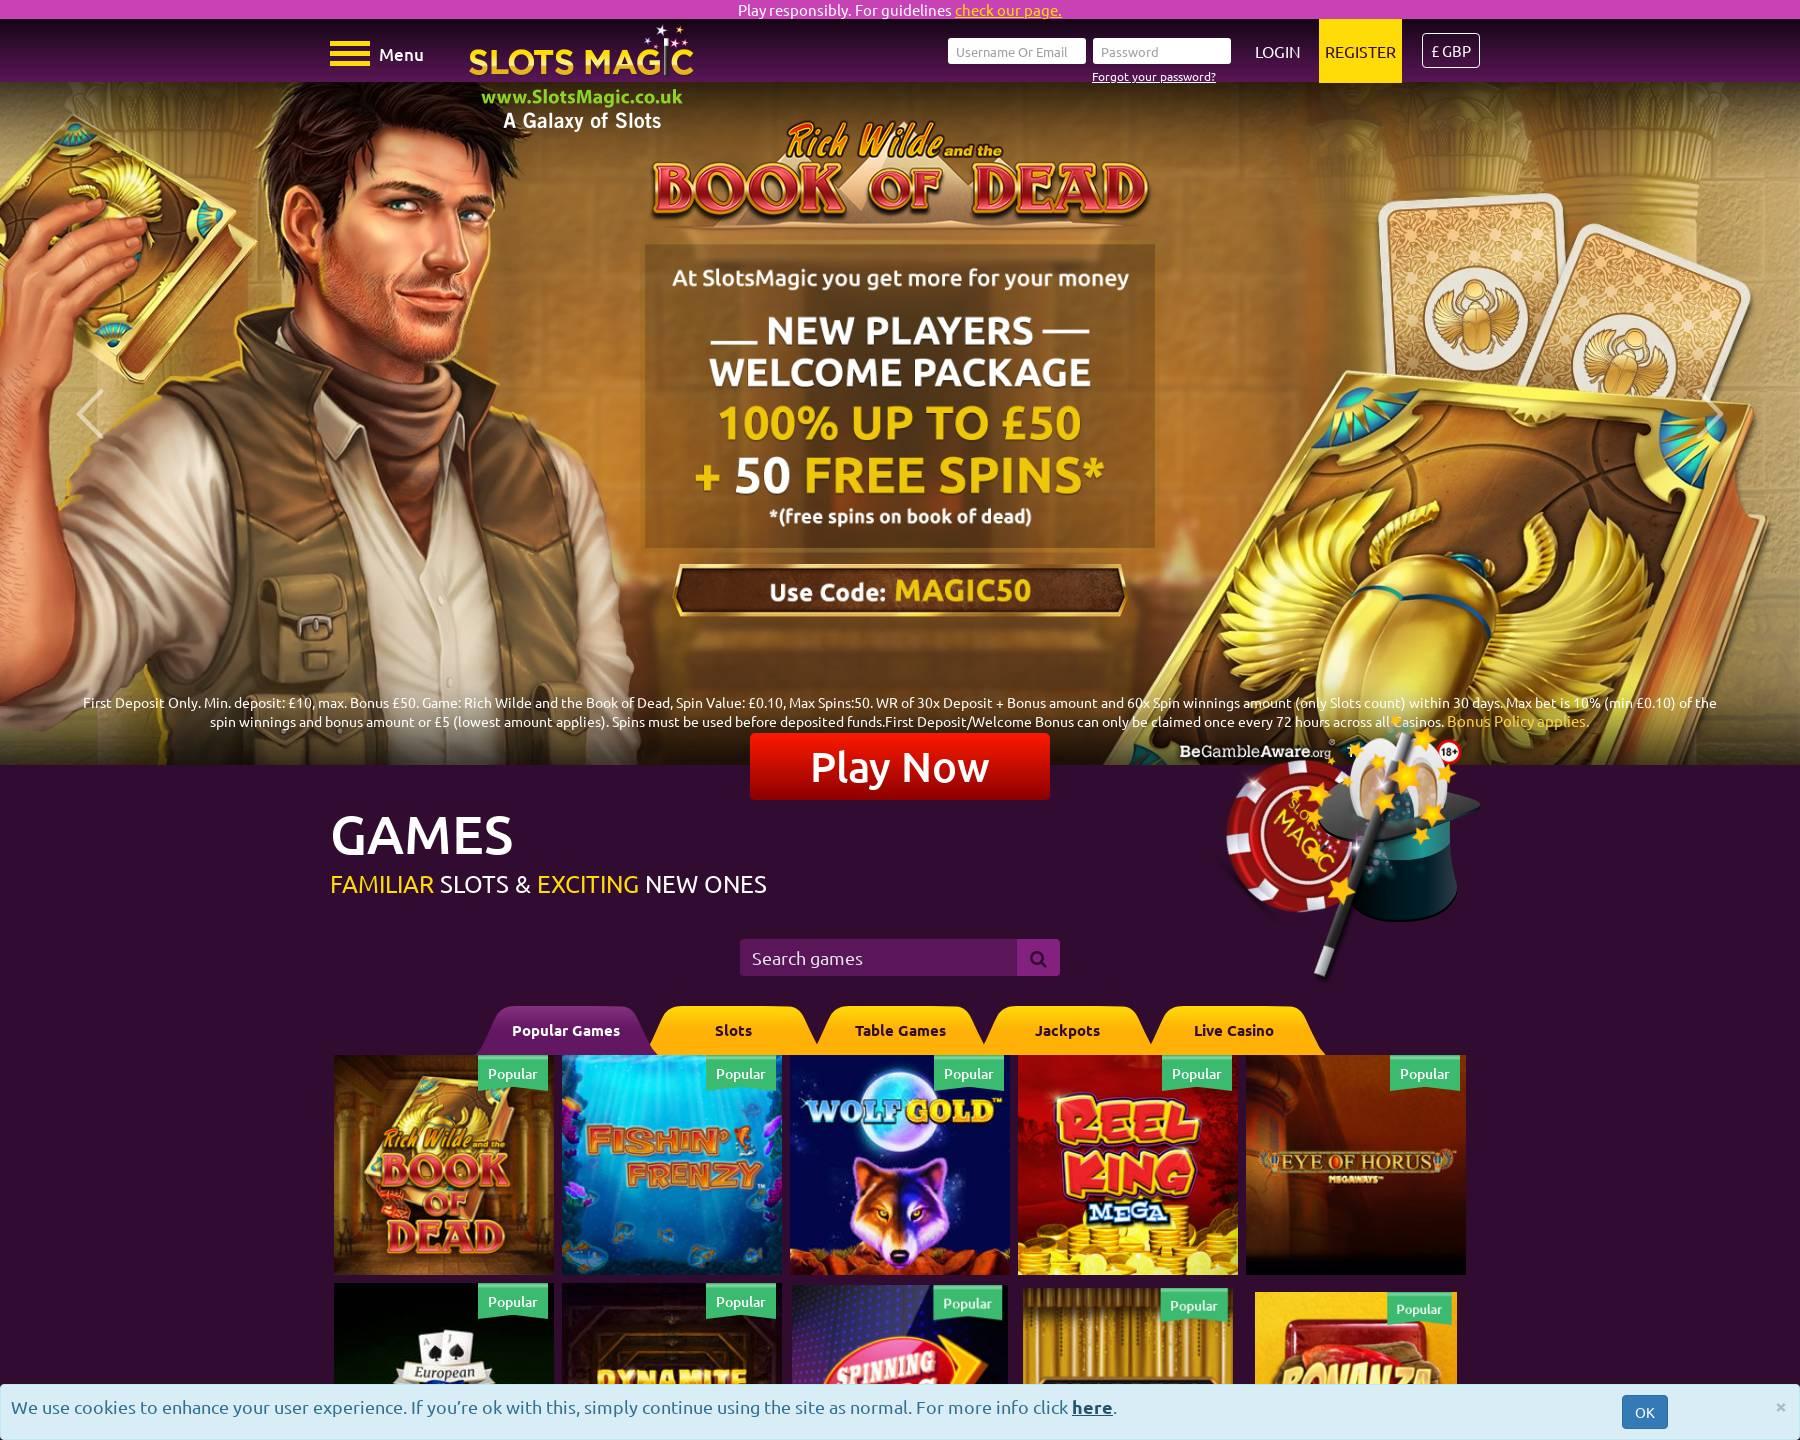 Slots magic bonus code ludwig wittgenstein poker